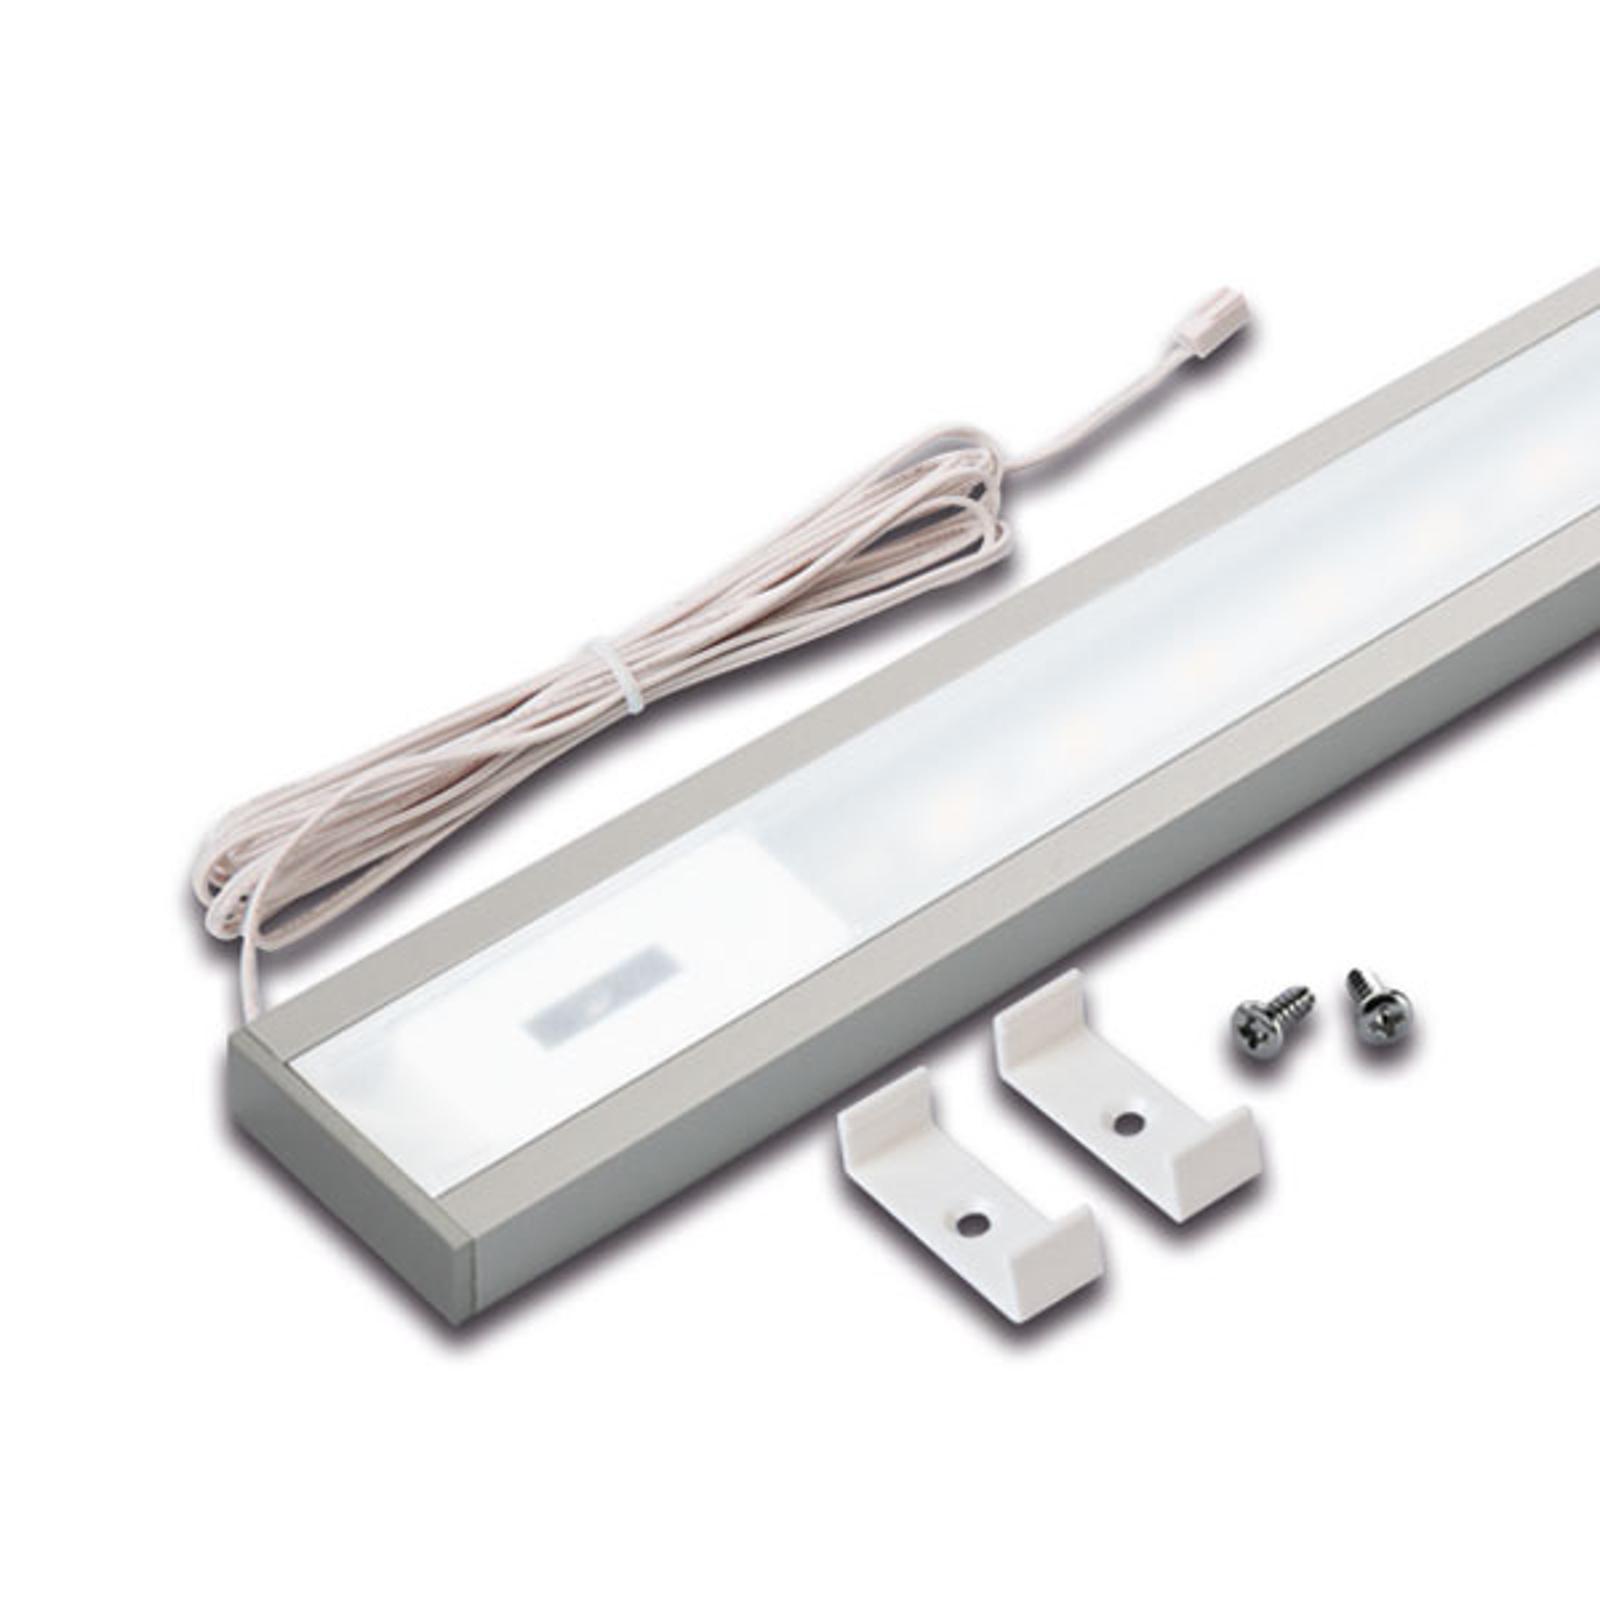 Lampada LED da mobili Top-Stick F lunga 60 cm